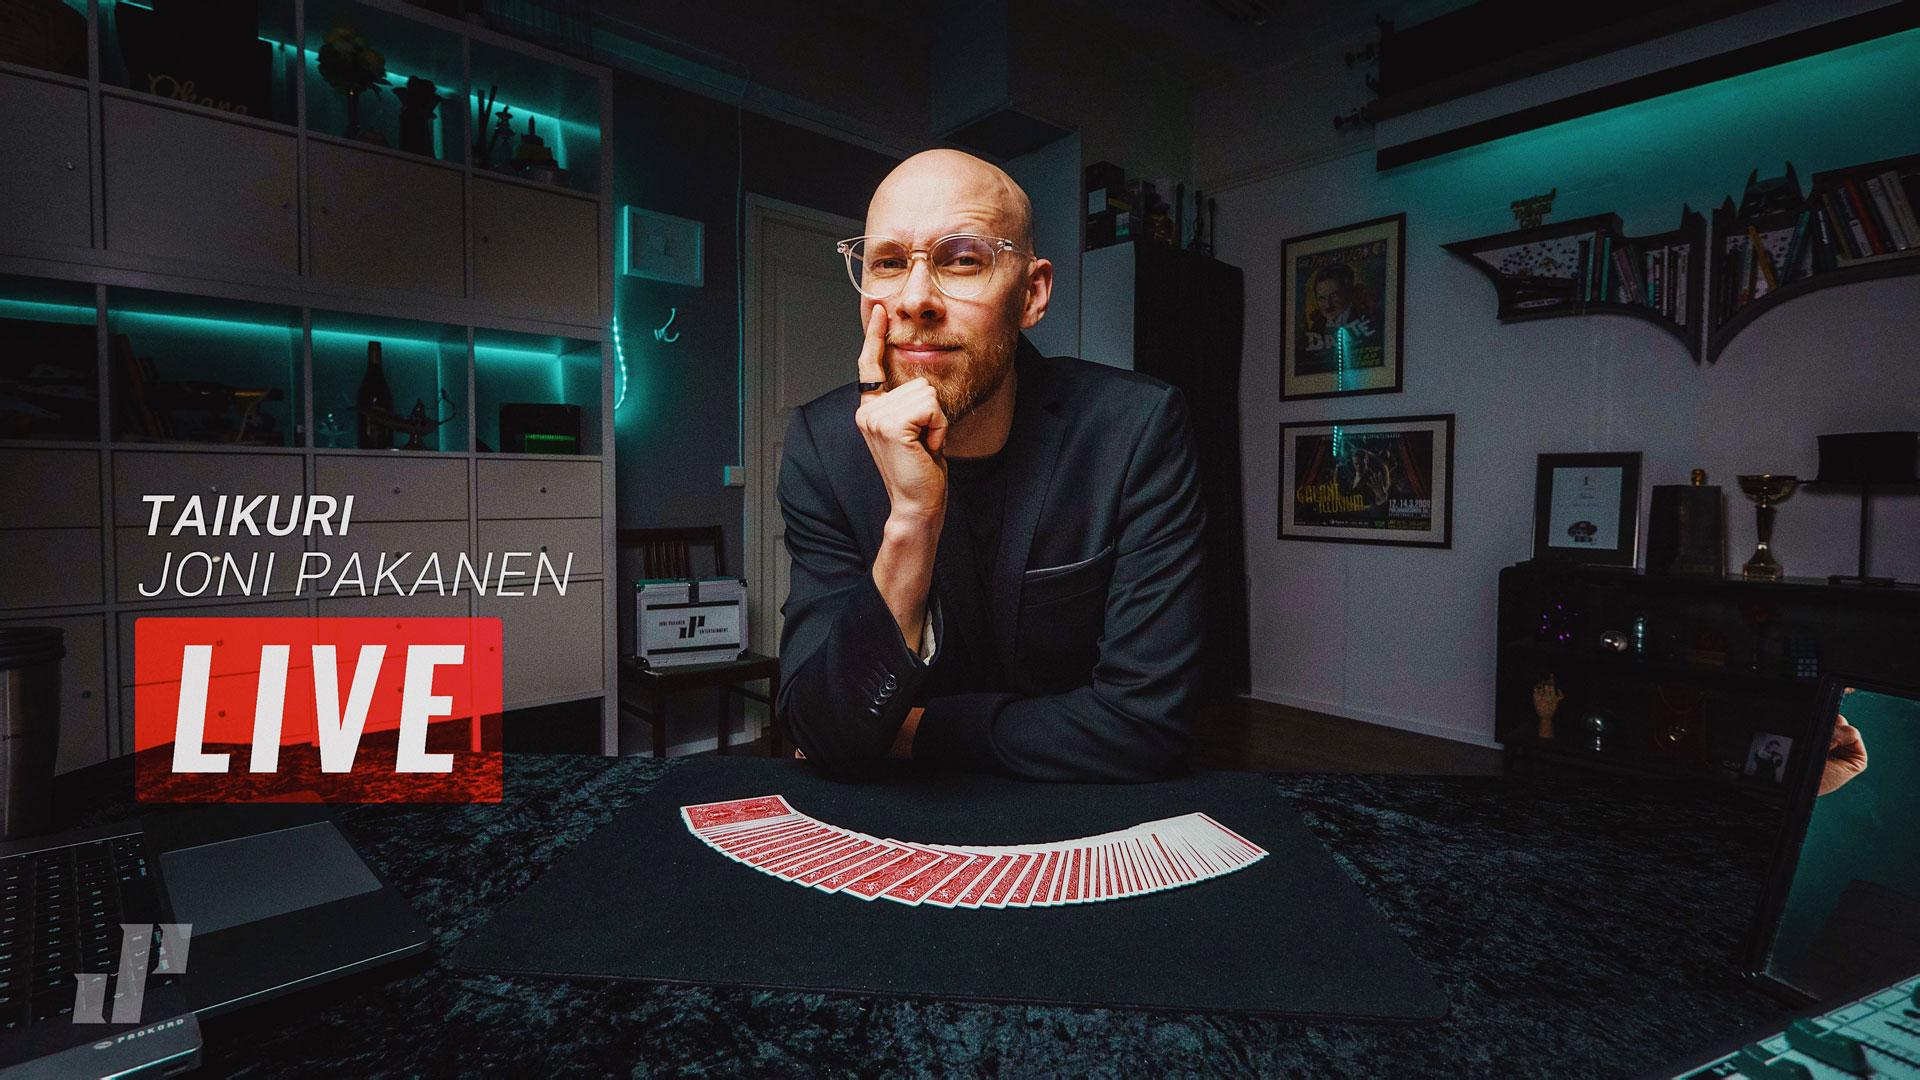 Link to event Magic Studio: Joni Pakanen